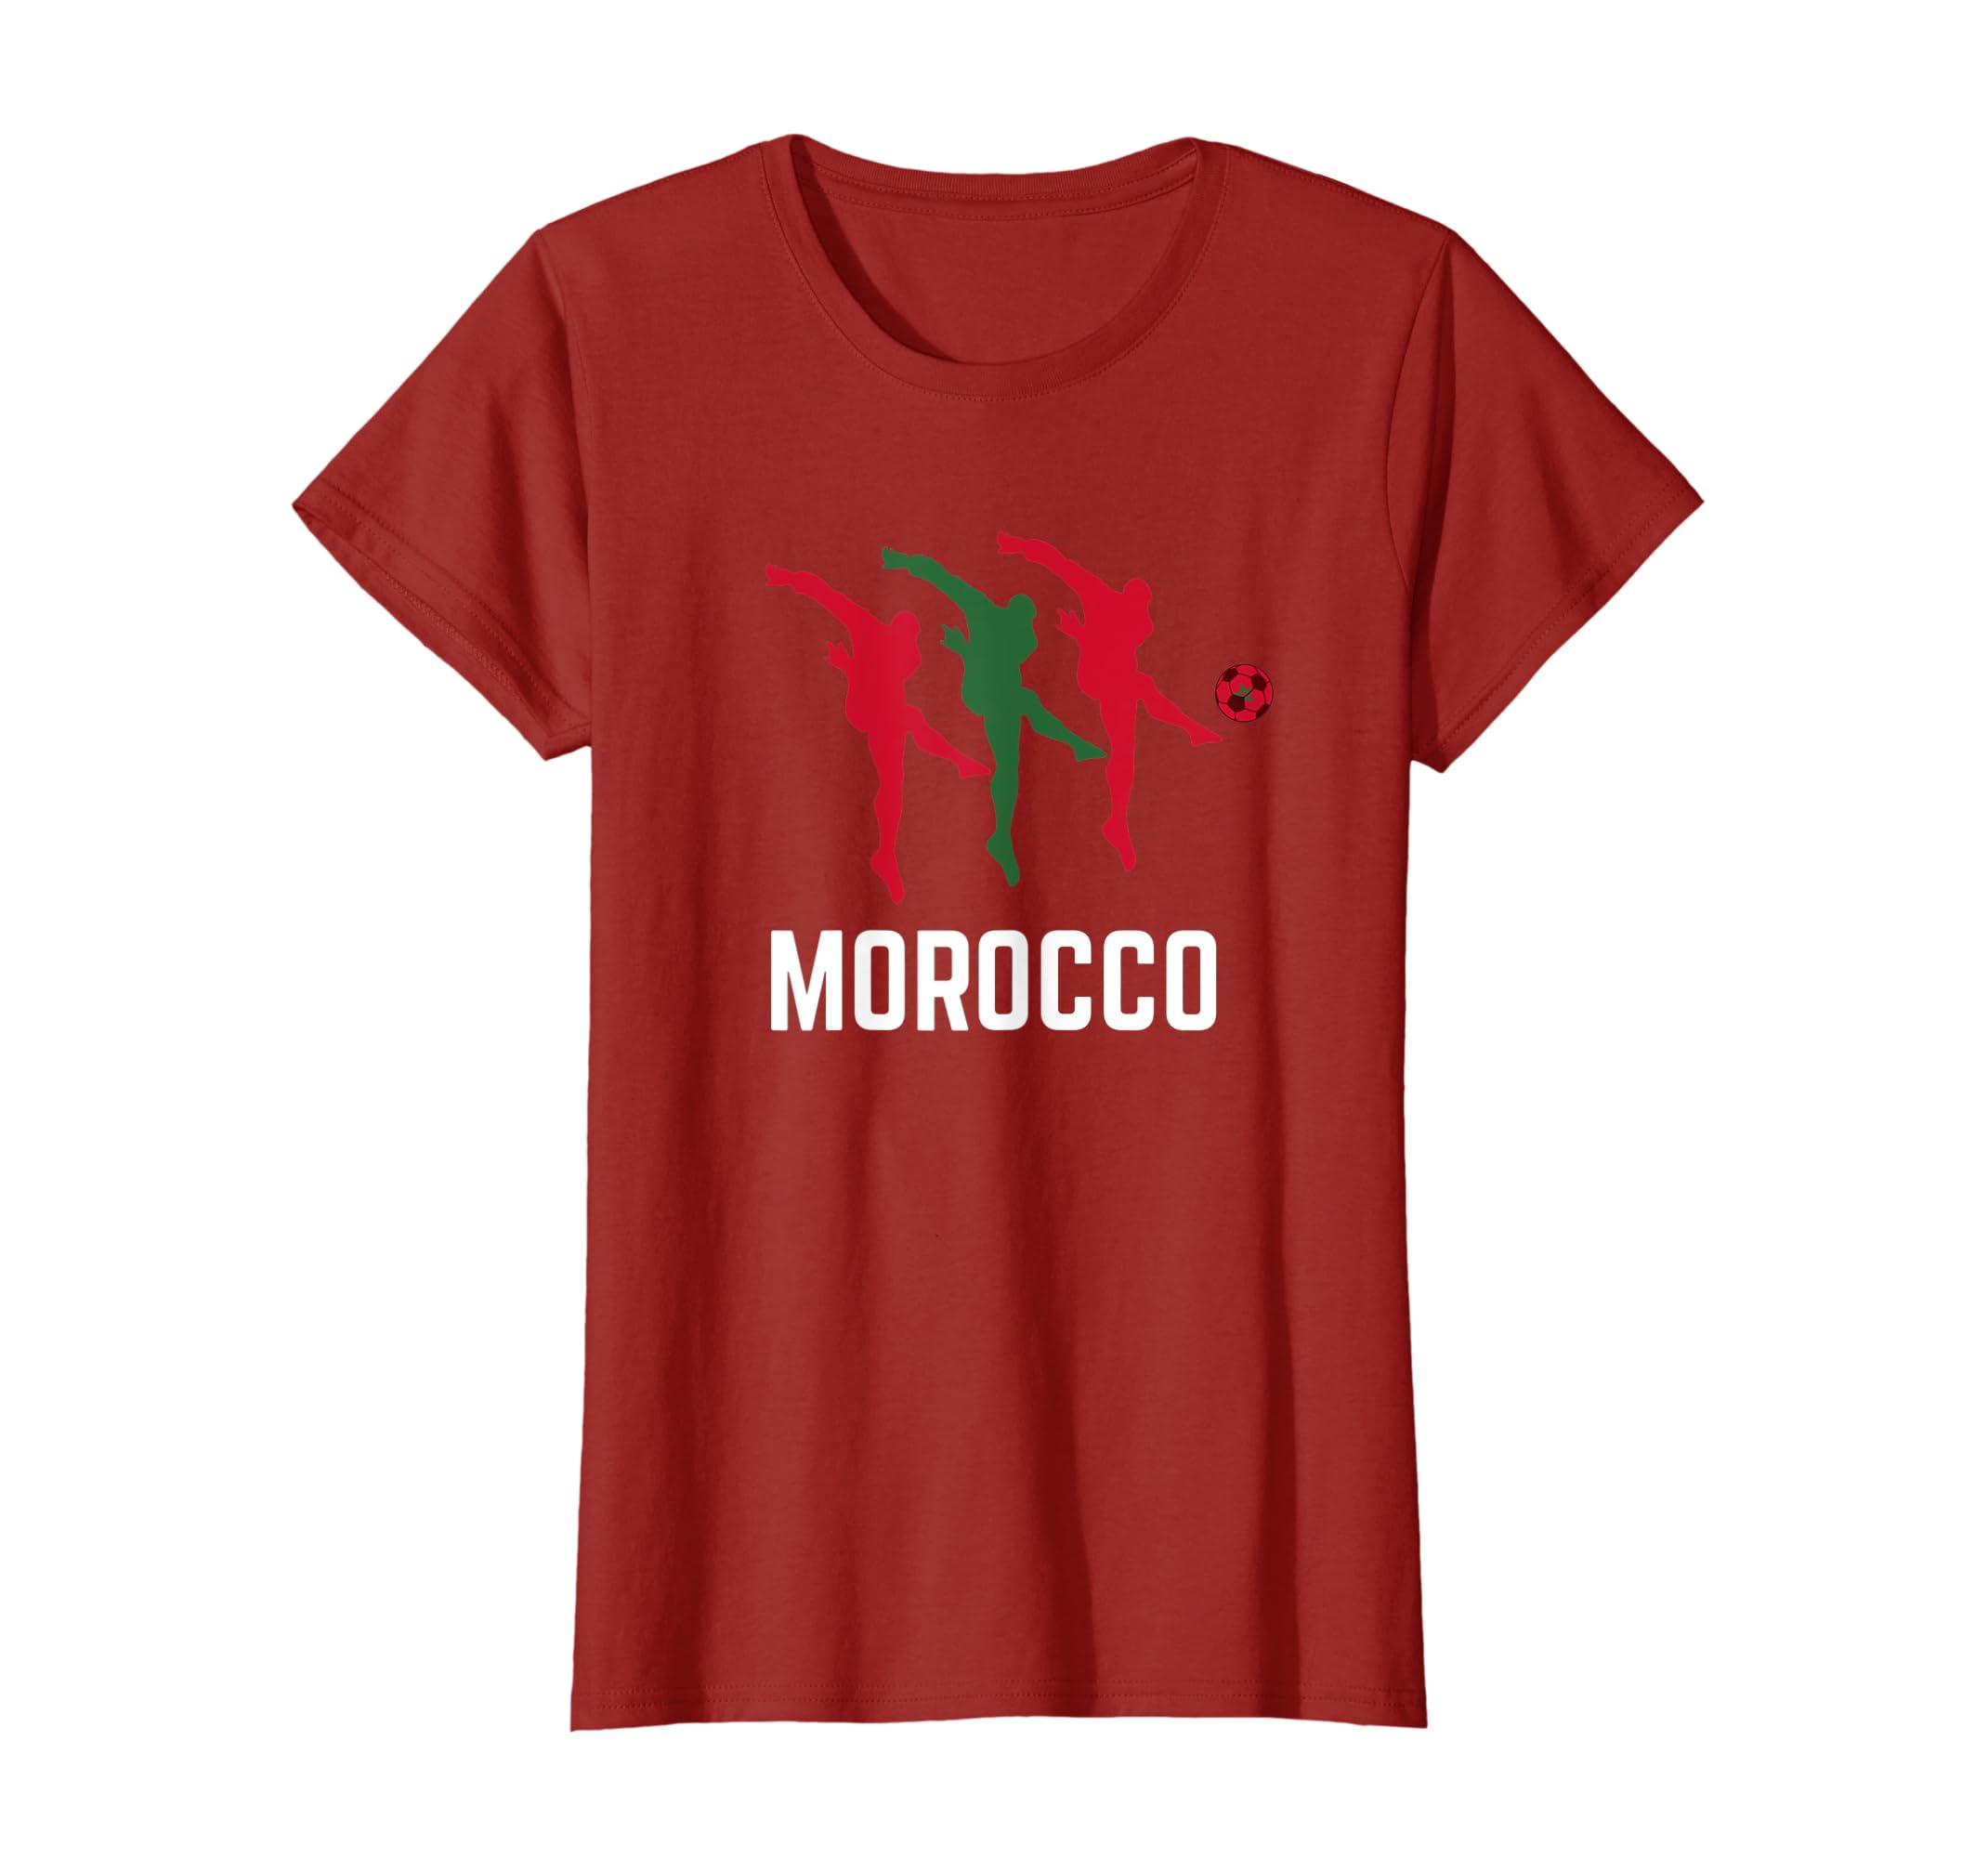 1d500ef7e8a Amazon.com: Morocco Soccer Jersey 2019 Moroccan Football Team Fan Shirt:  Clothing